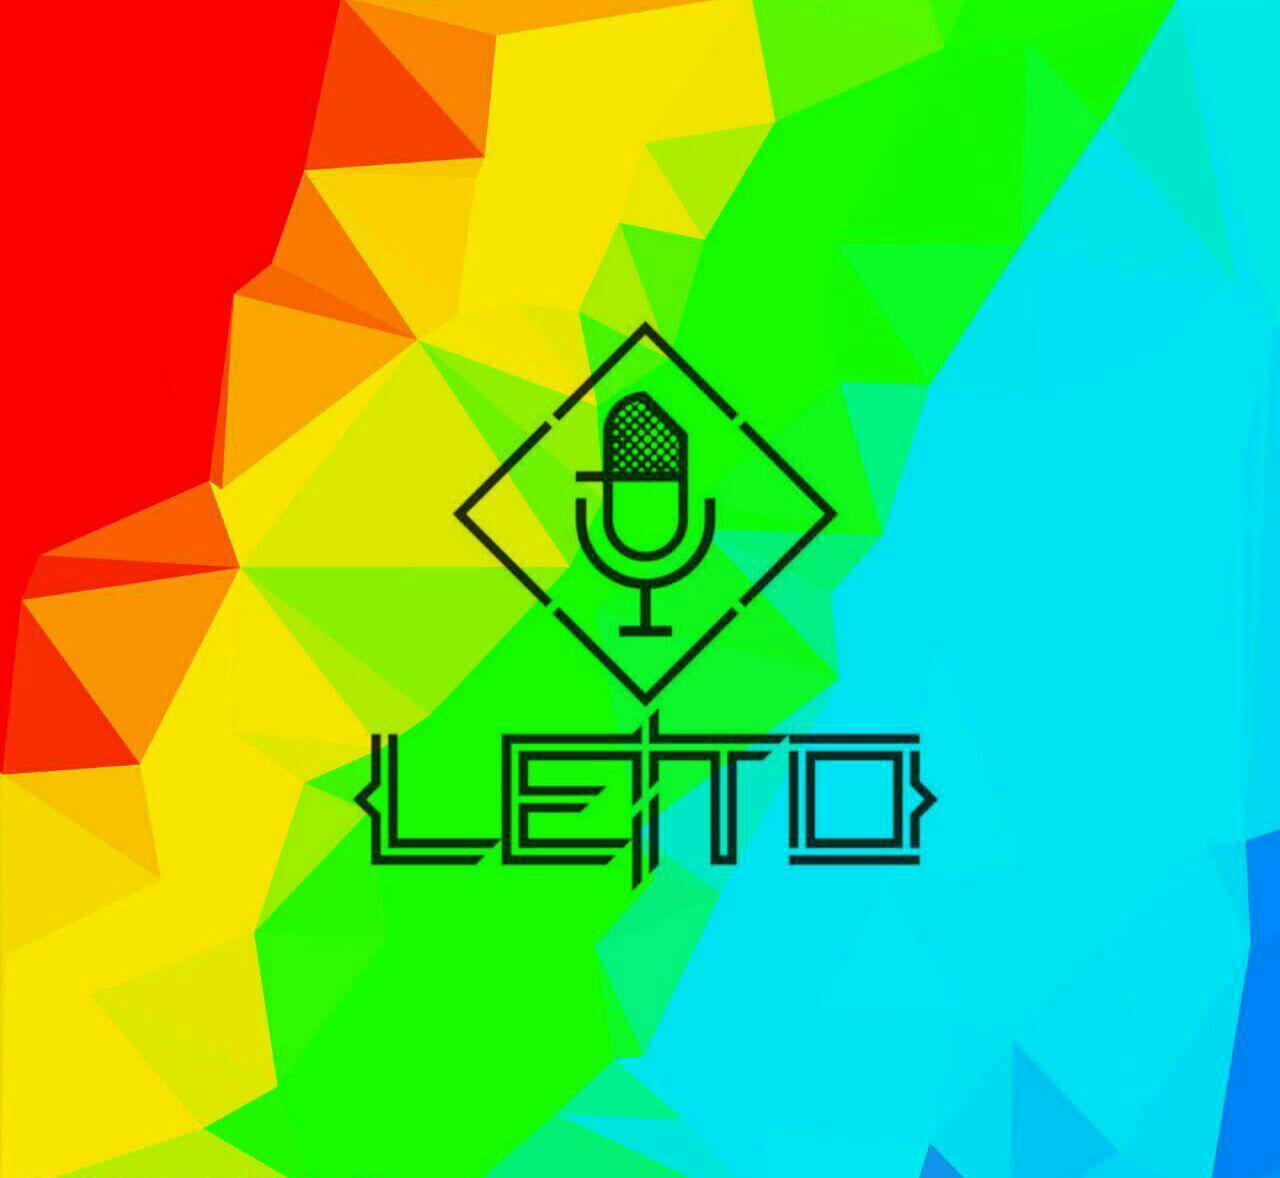 http://up.leito.ir/view/1566550/LeitoRangiLogo.jpg